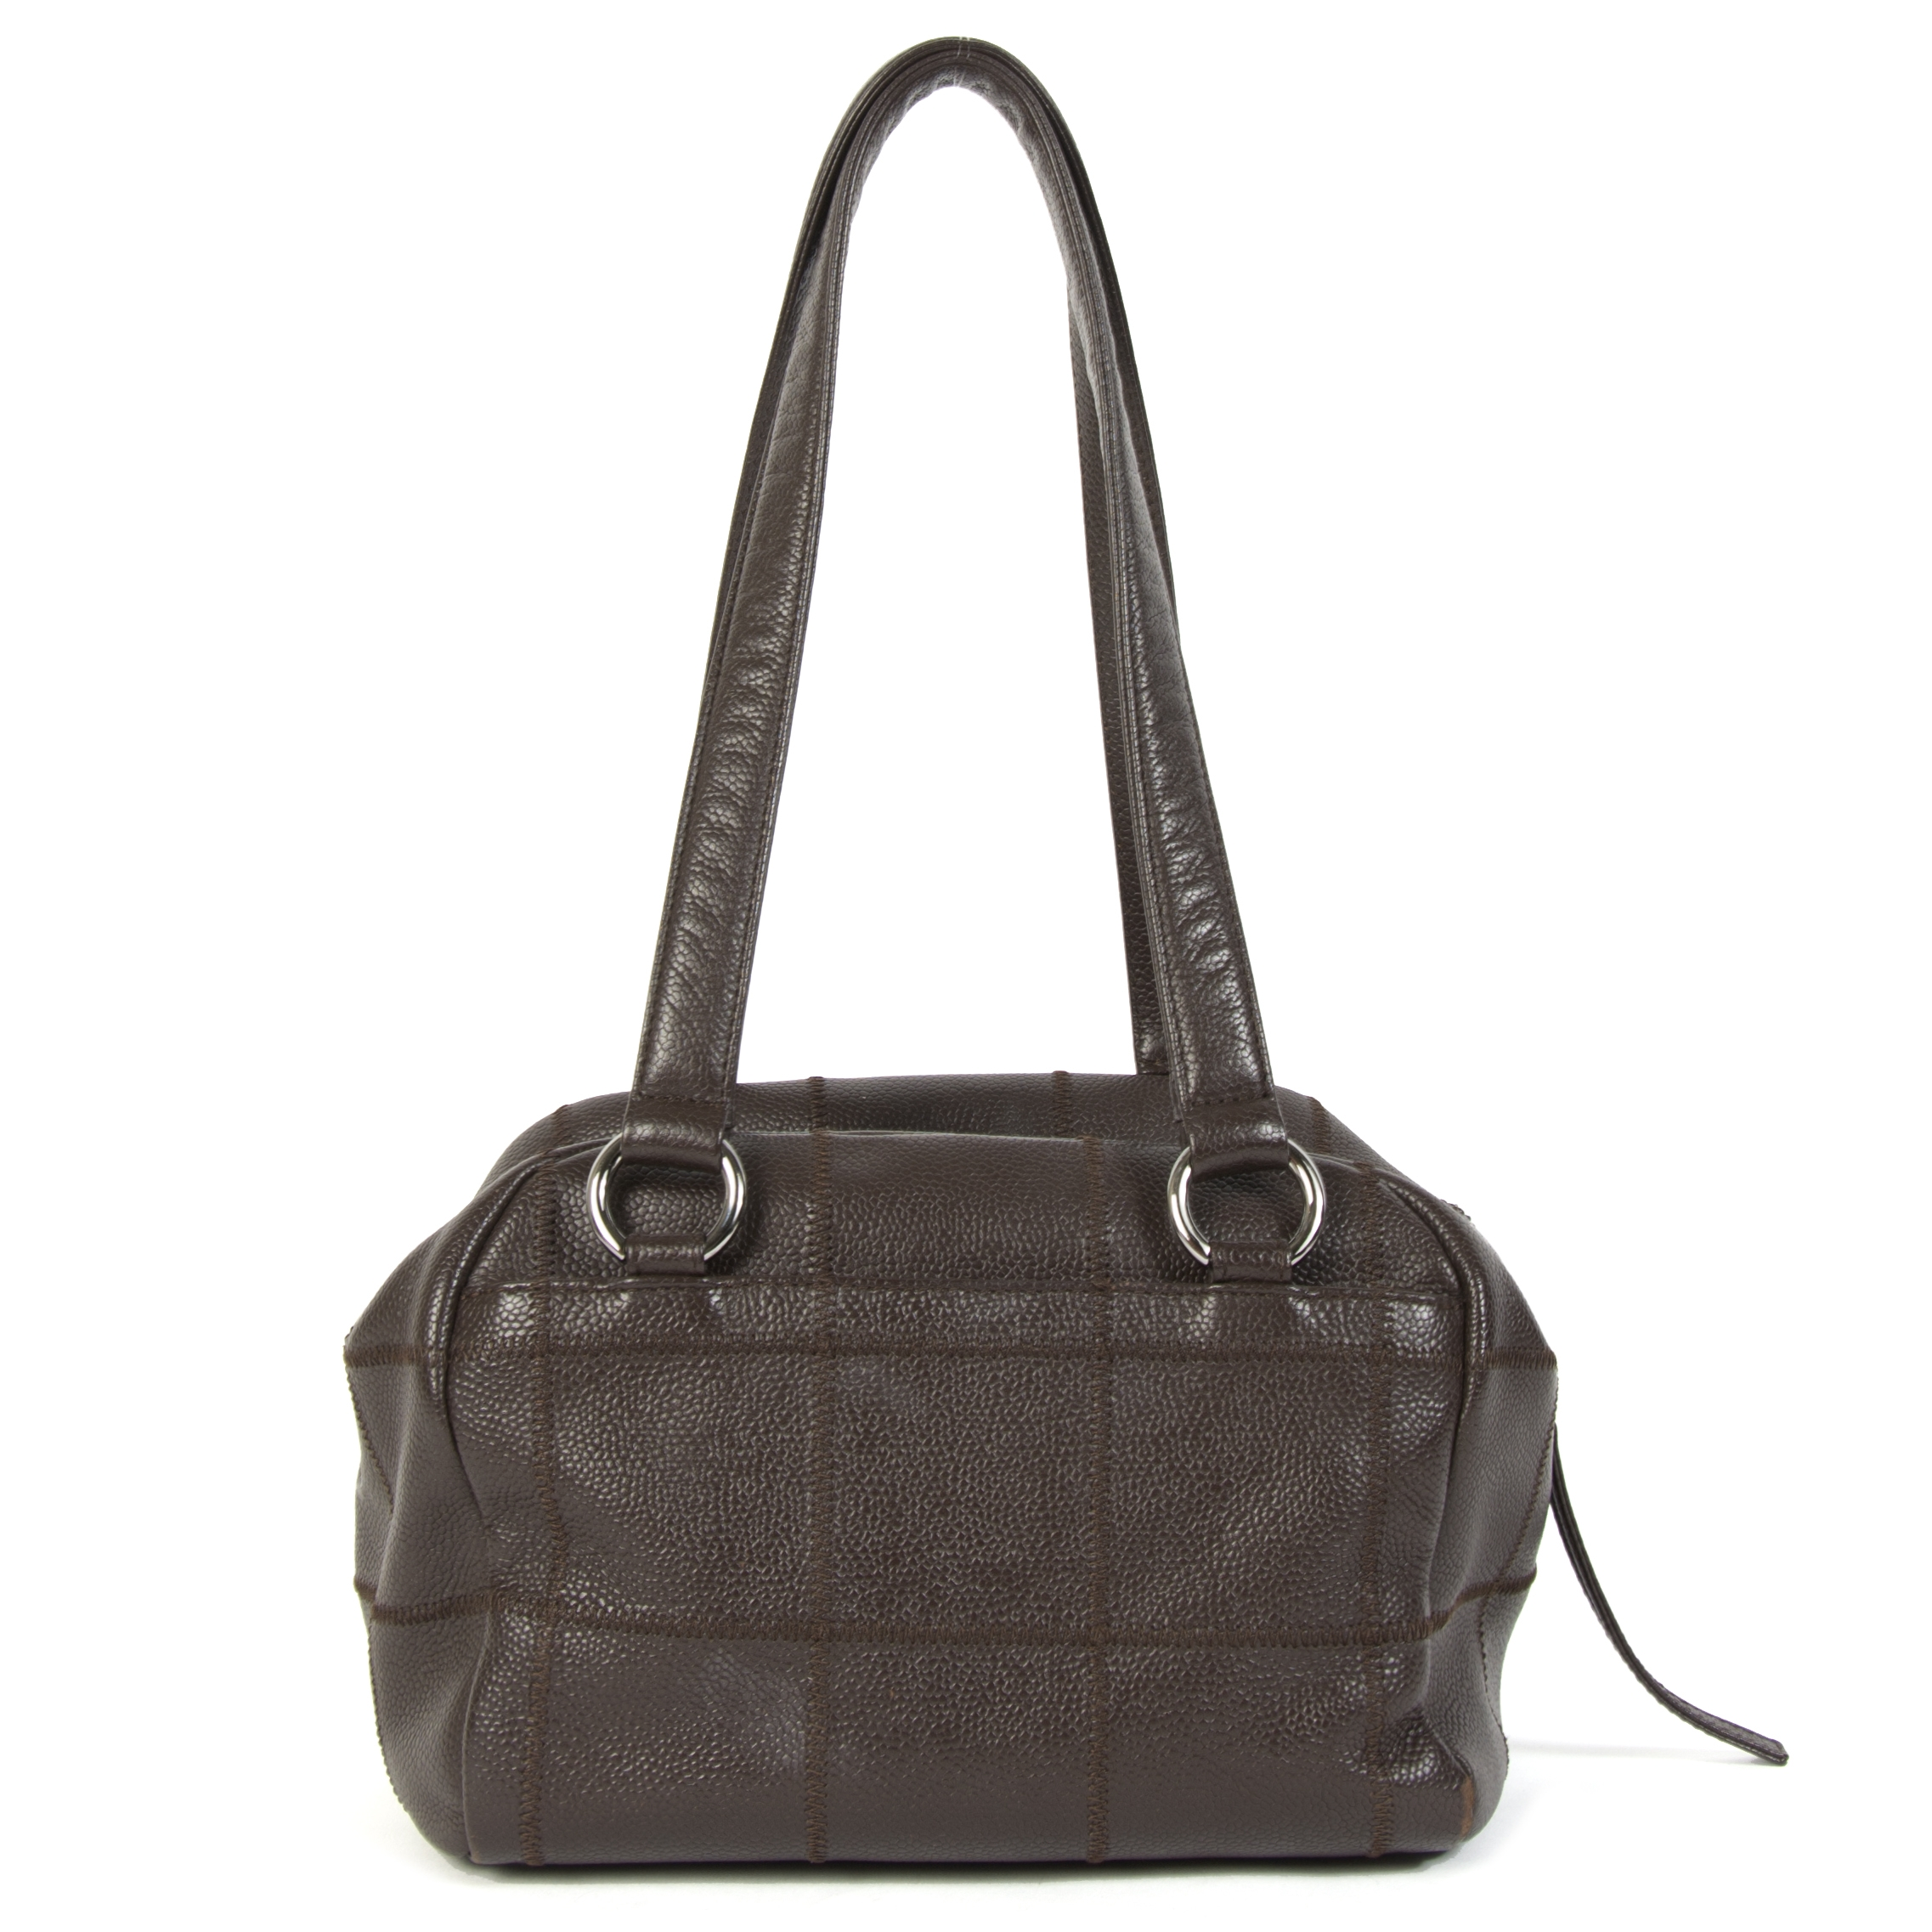 Chanel Brown Coco Bar Caviar Leather Shoulder Bag